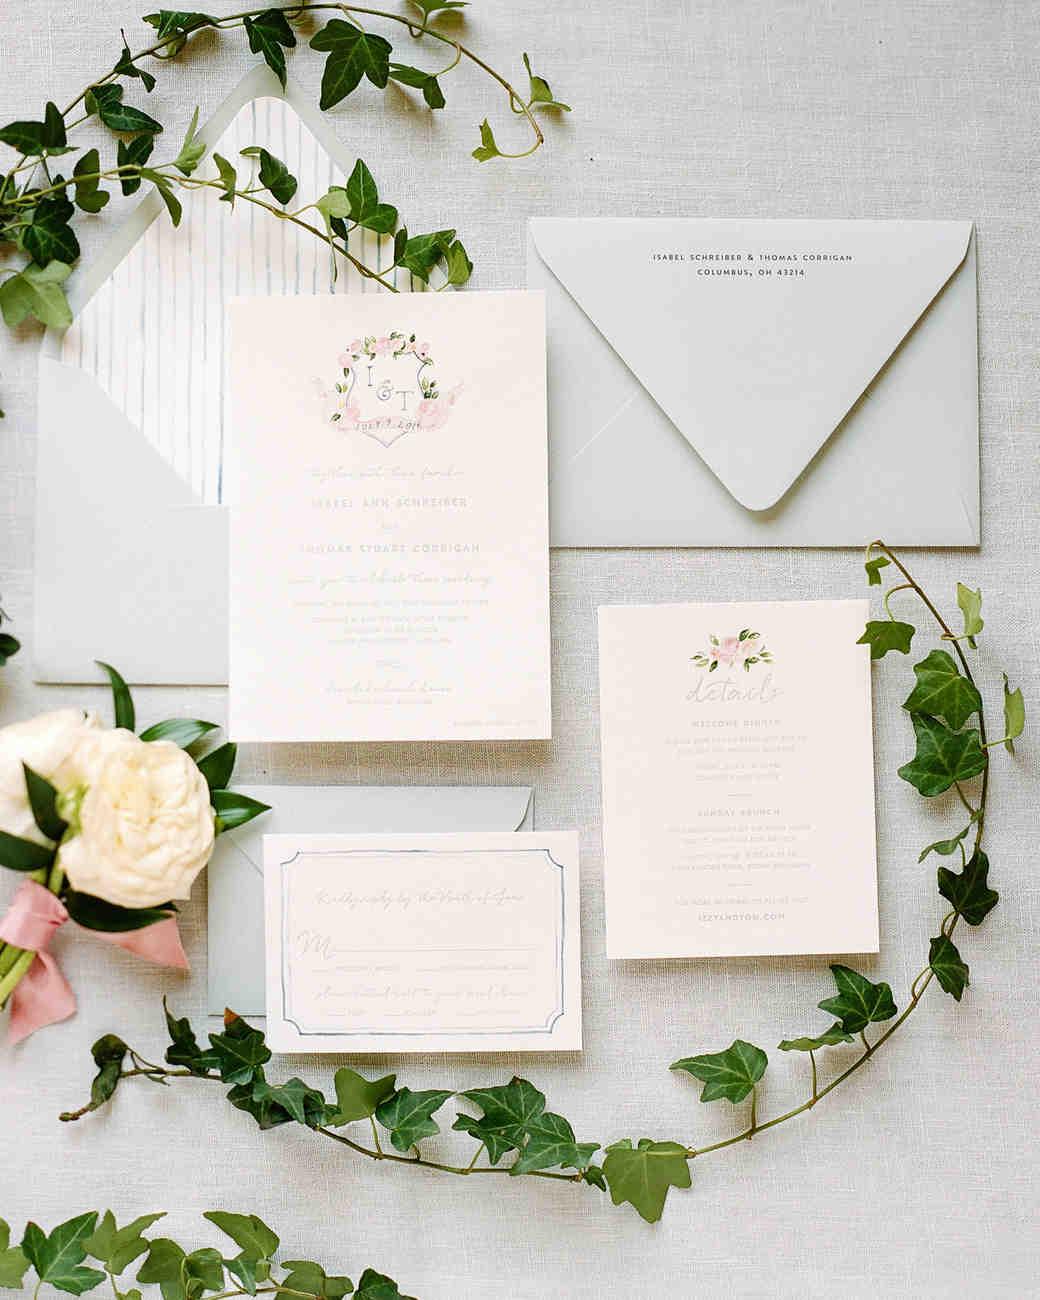 Wedding Invitations Ideas Pinterest: A Summery, Lakeside Wedding In Michigan